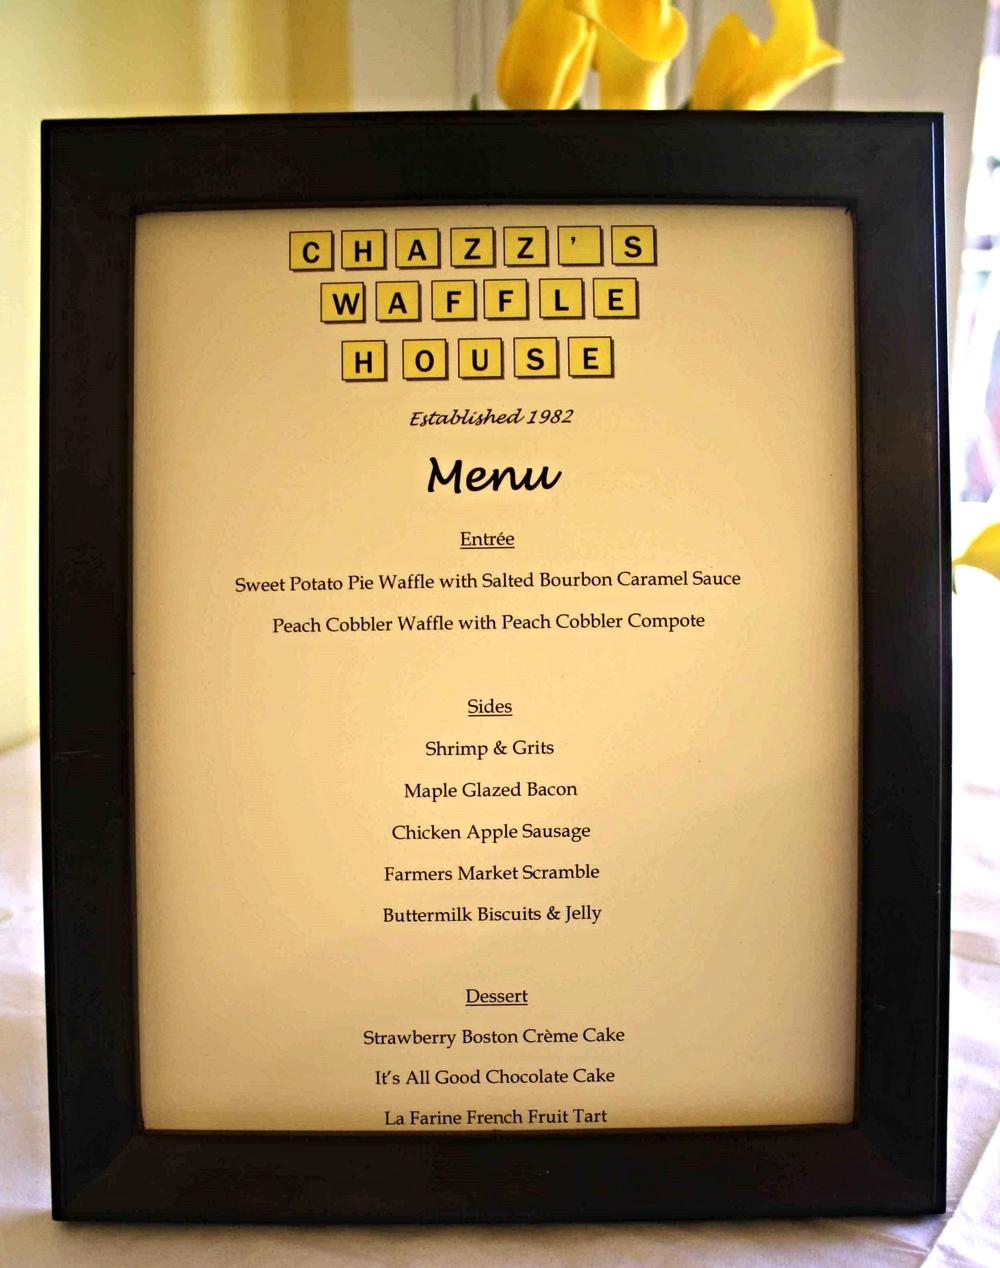 "img src=""httpwww.theparkwayevents.jpg"" alt=""San Francisco Bay Area Event Planner Outdoor Dinner Party Custom Menu"".jpg"